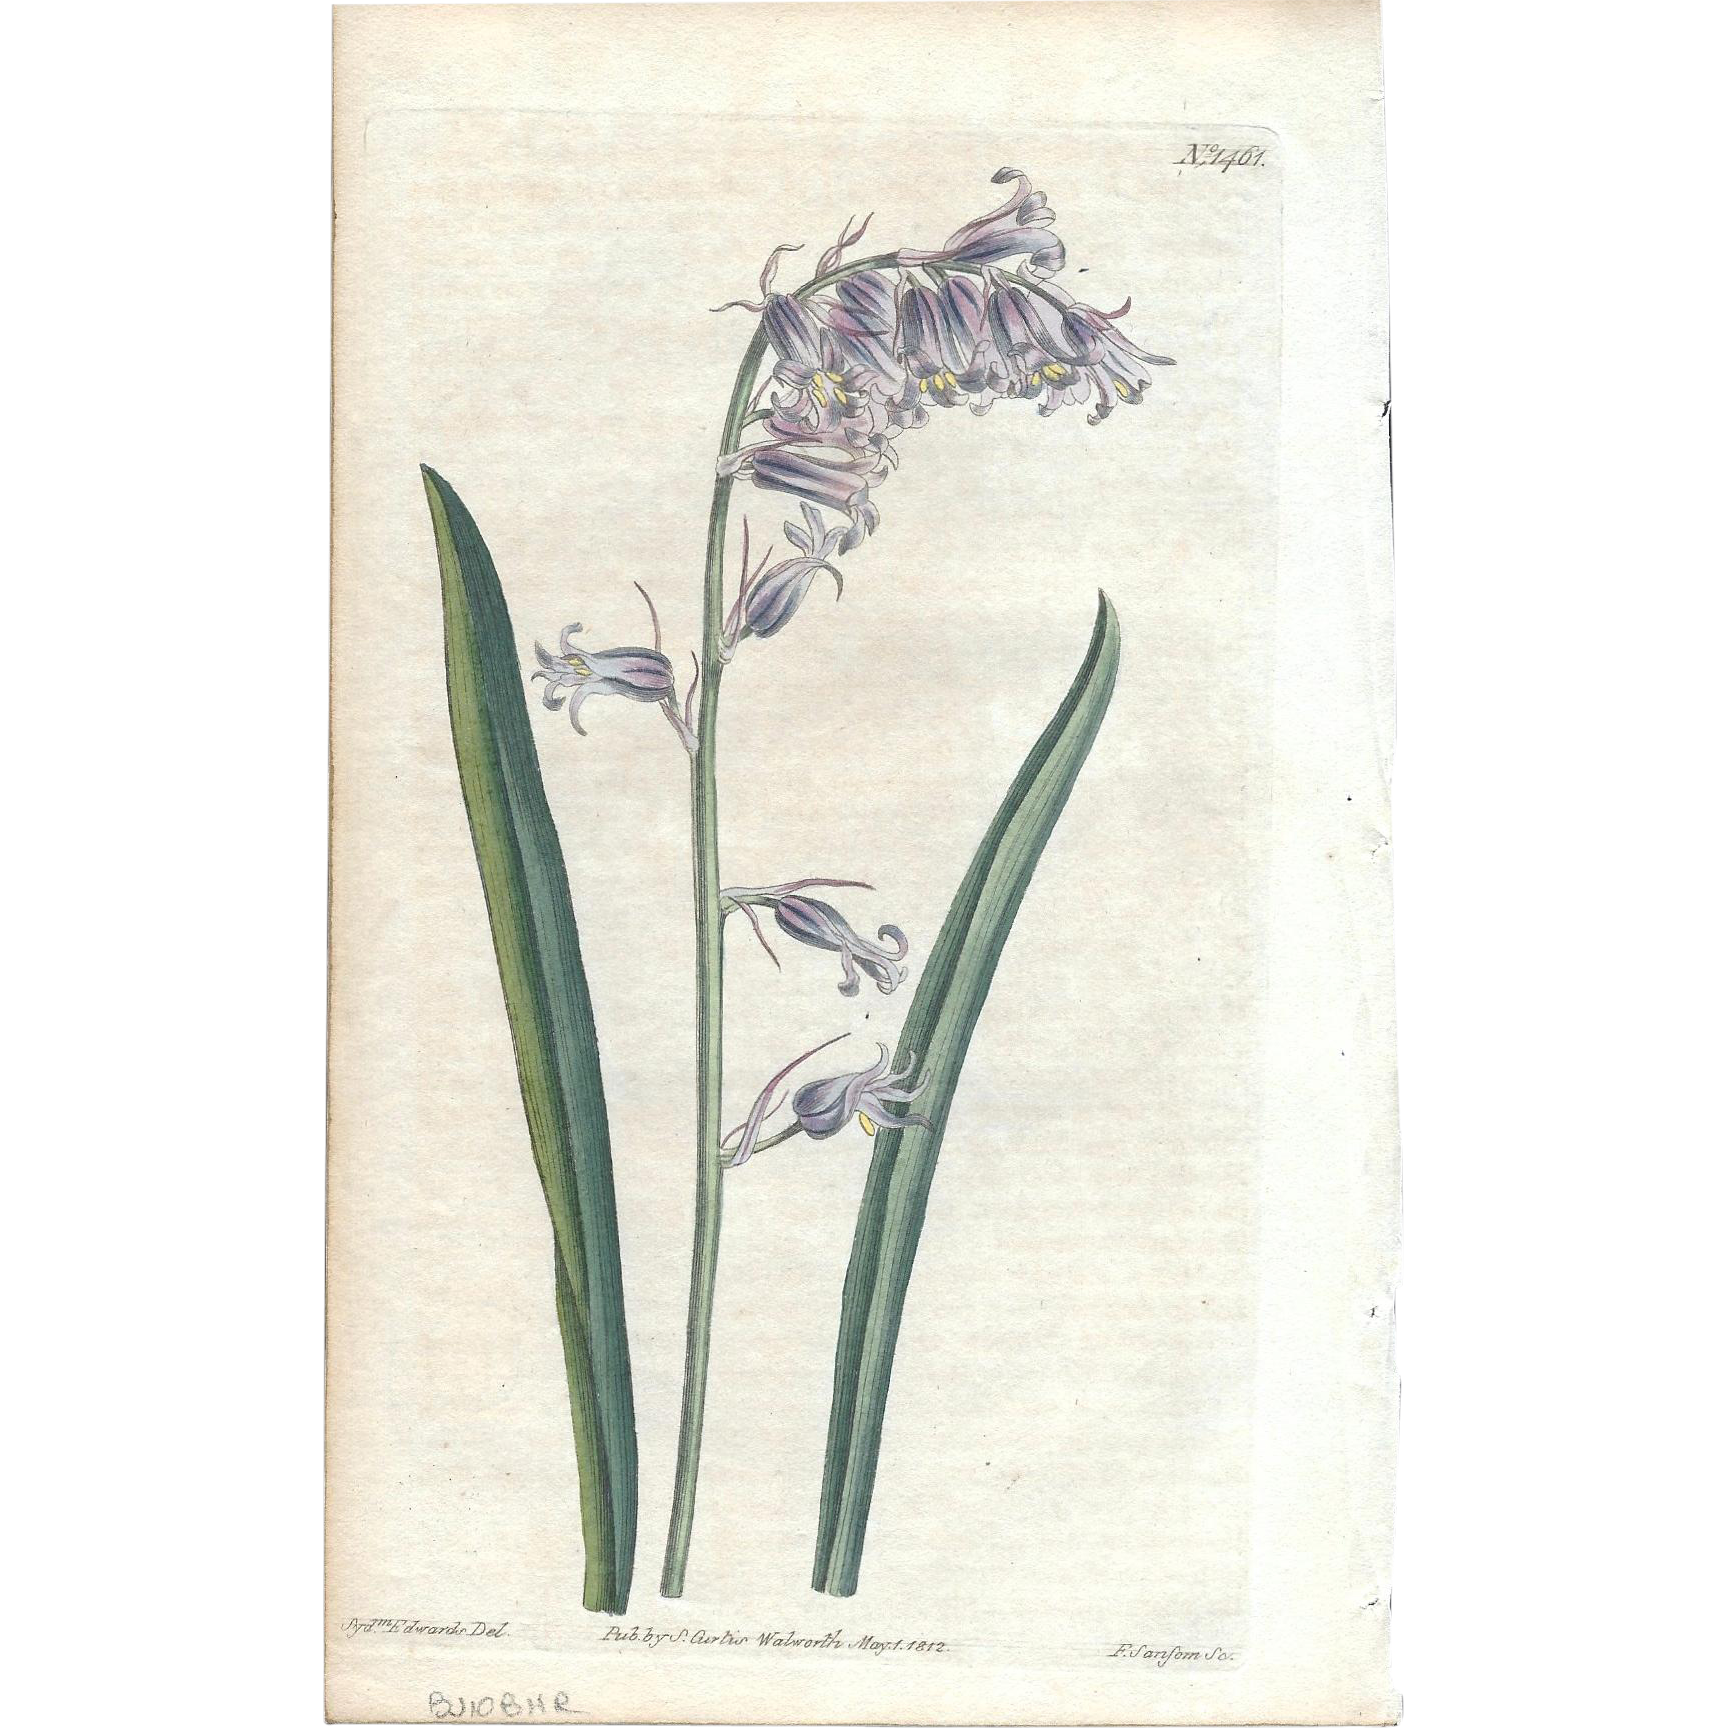 Lovely CURTIS Botanical Print circa 1812 PINK-COLORED HAREBELLS